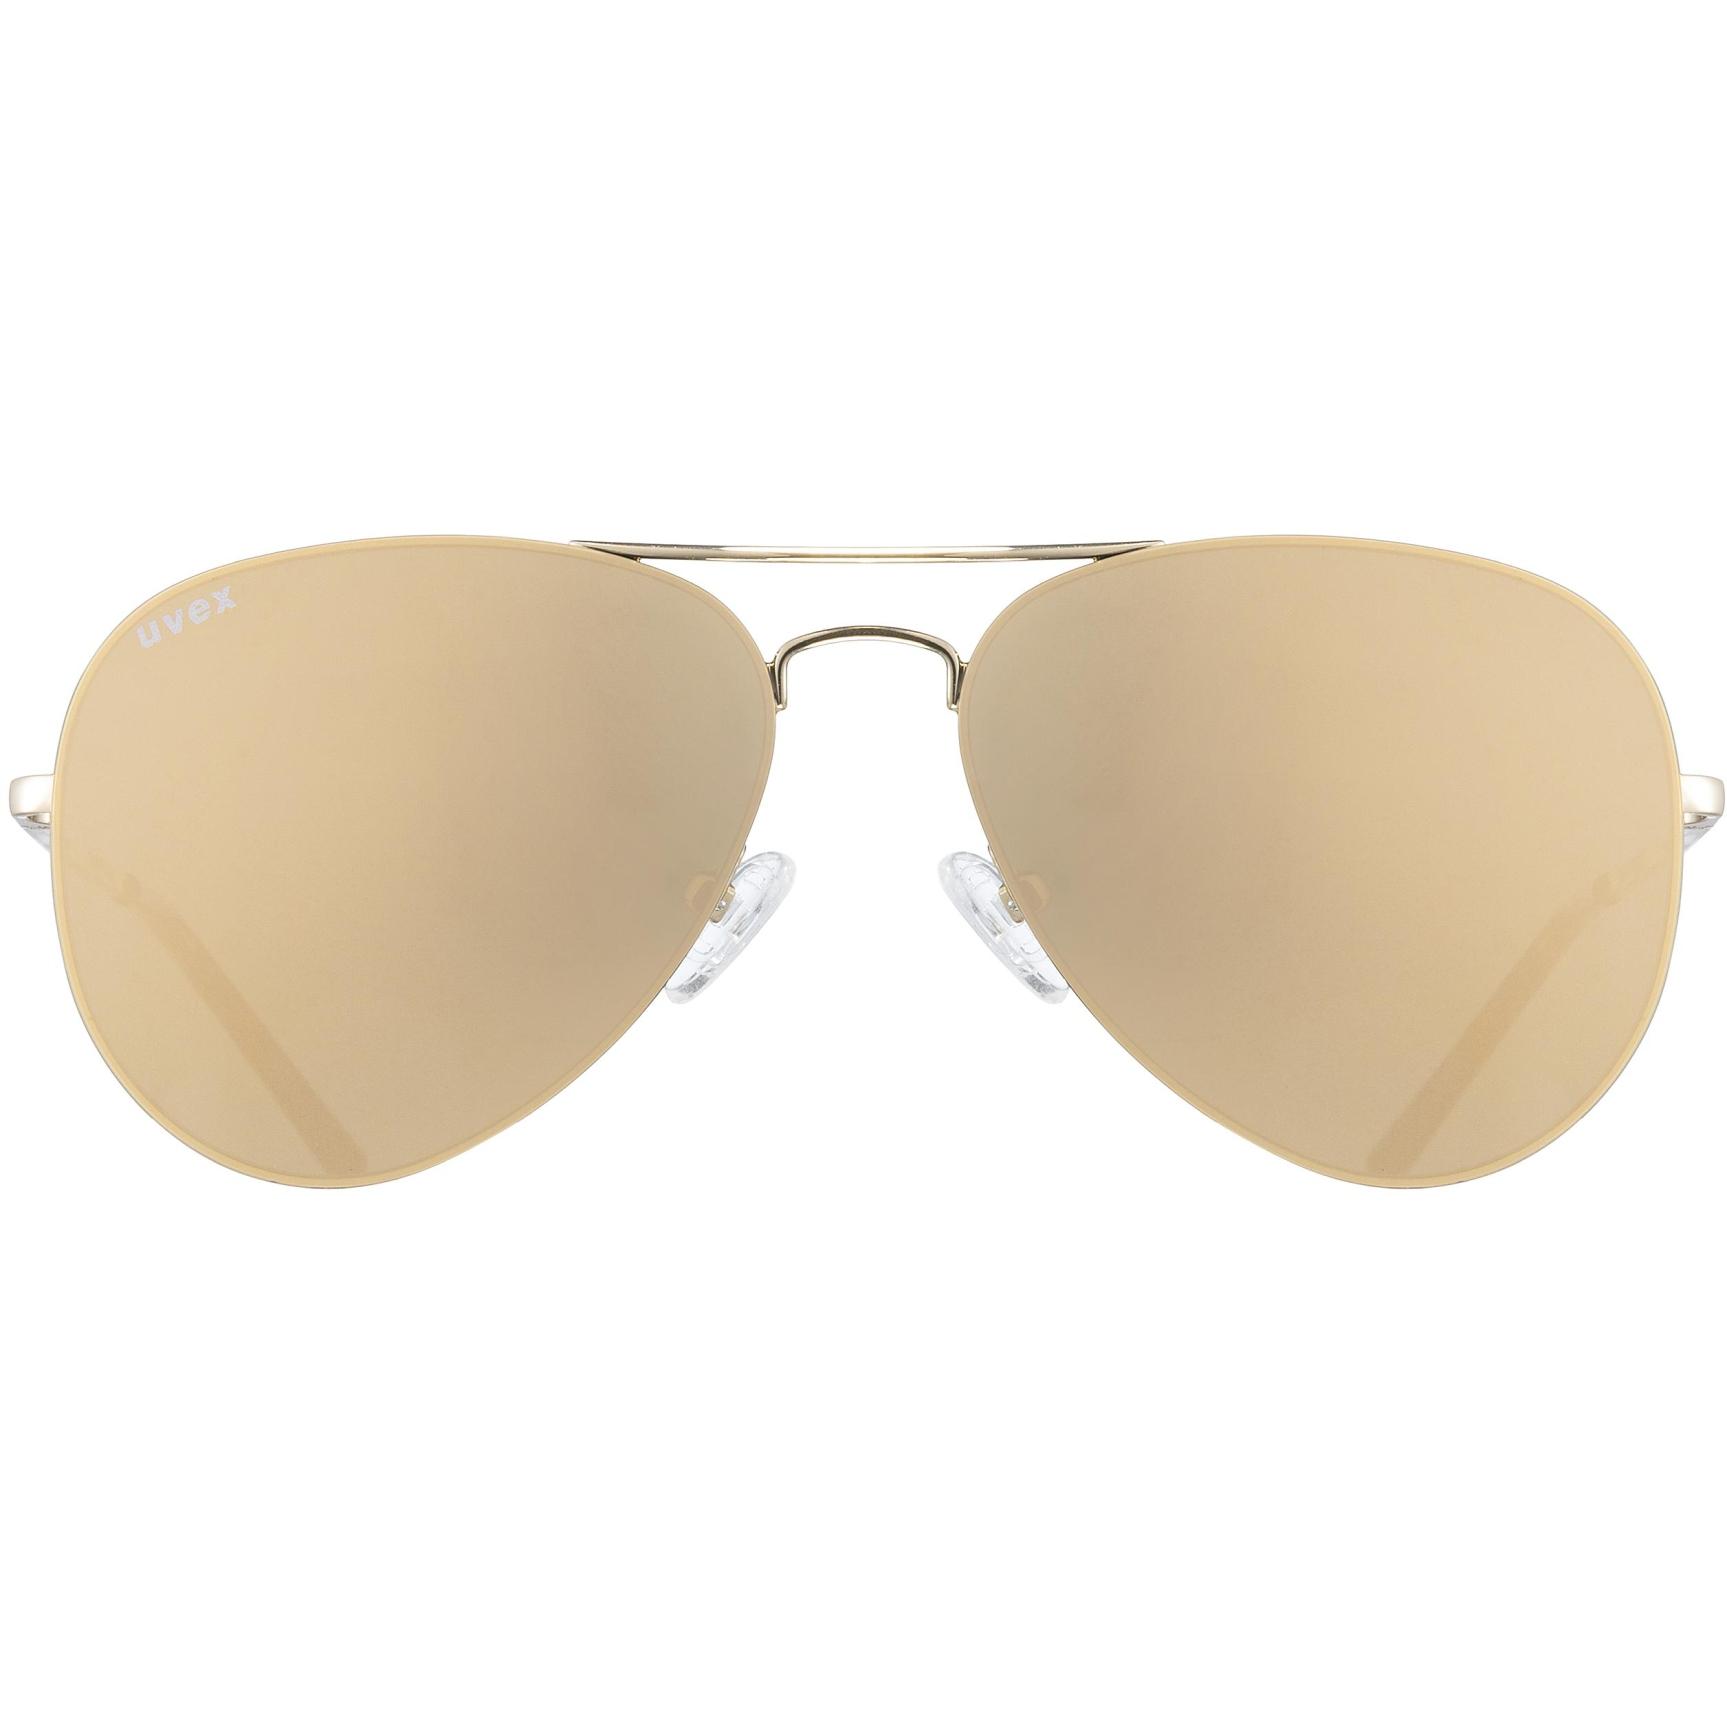 Image of Uvex lgl 45 Glasses - gold/miror gold